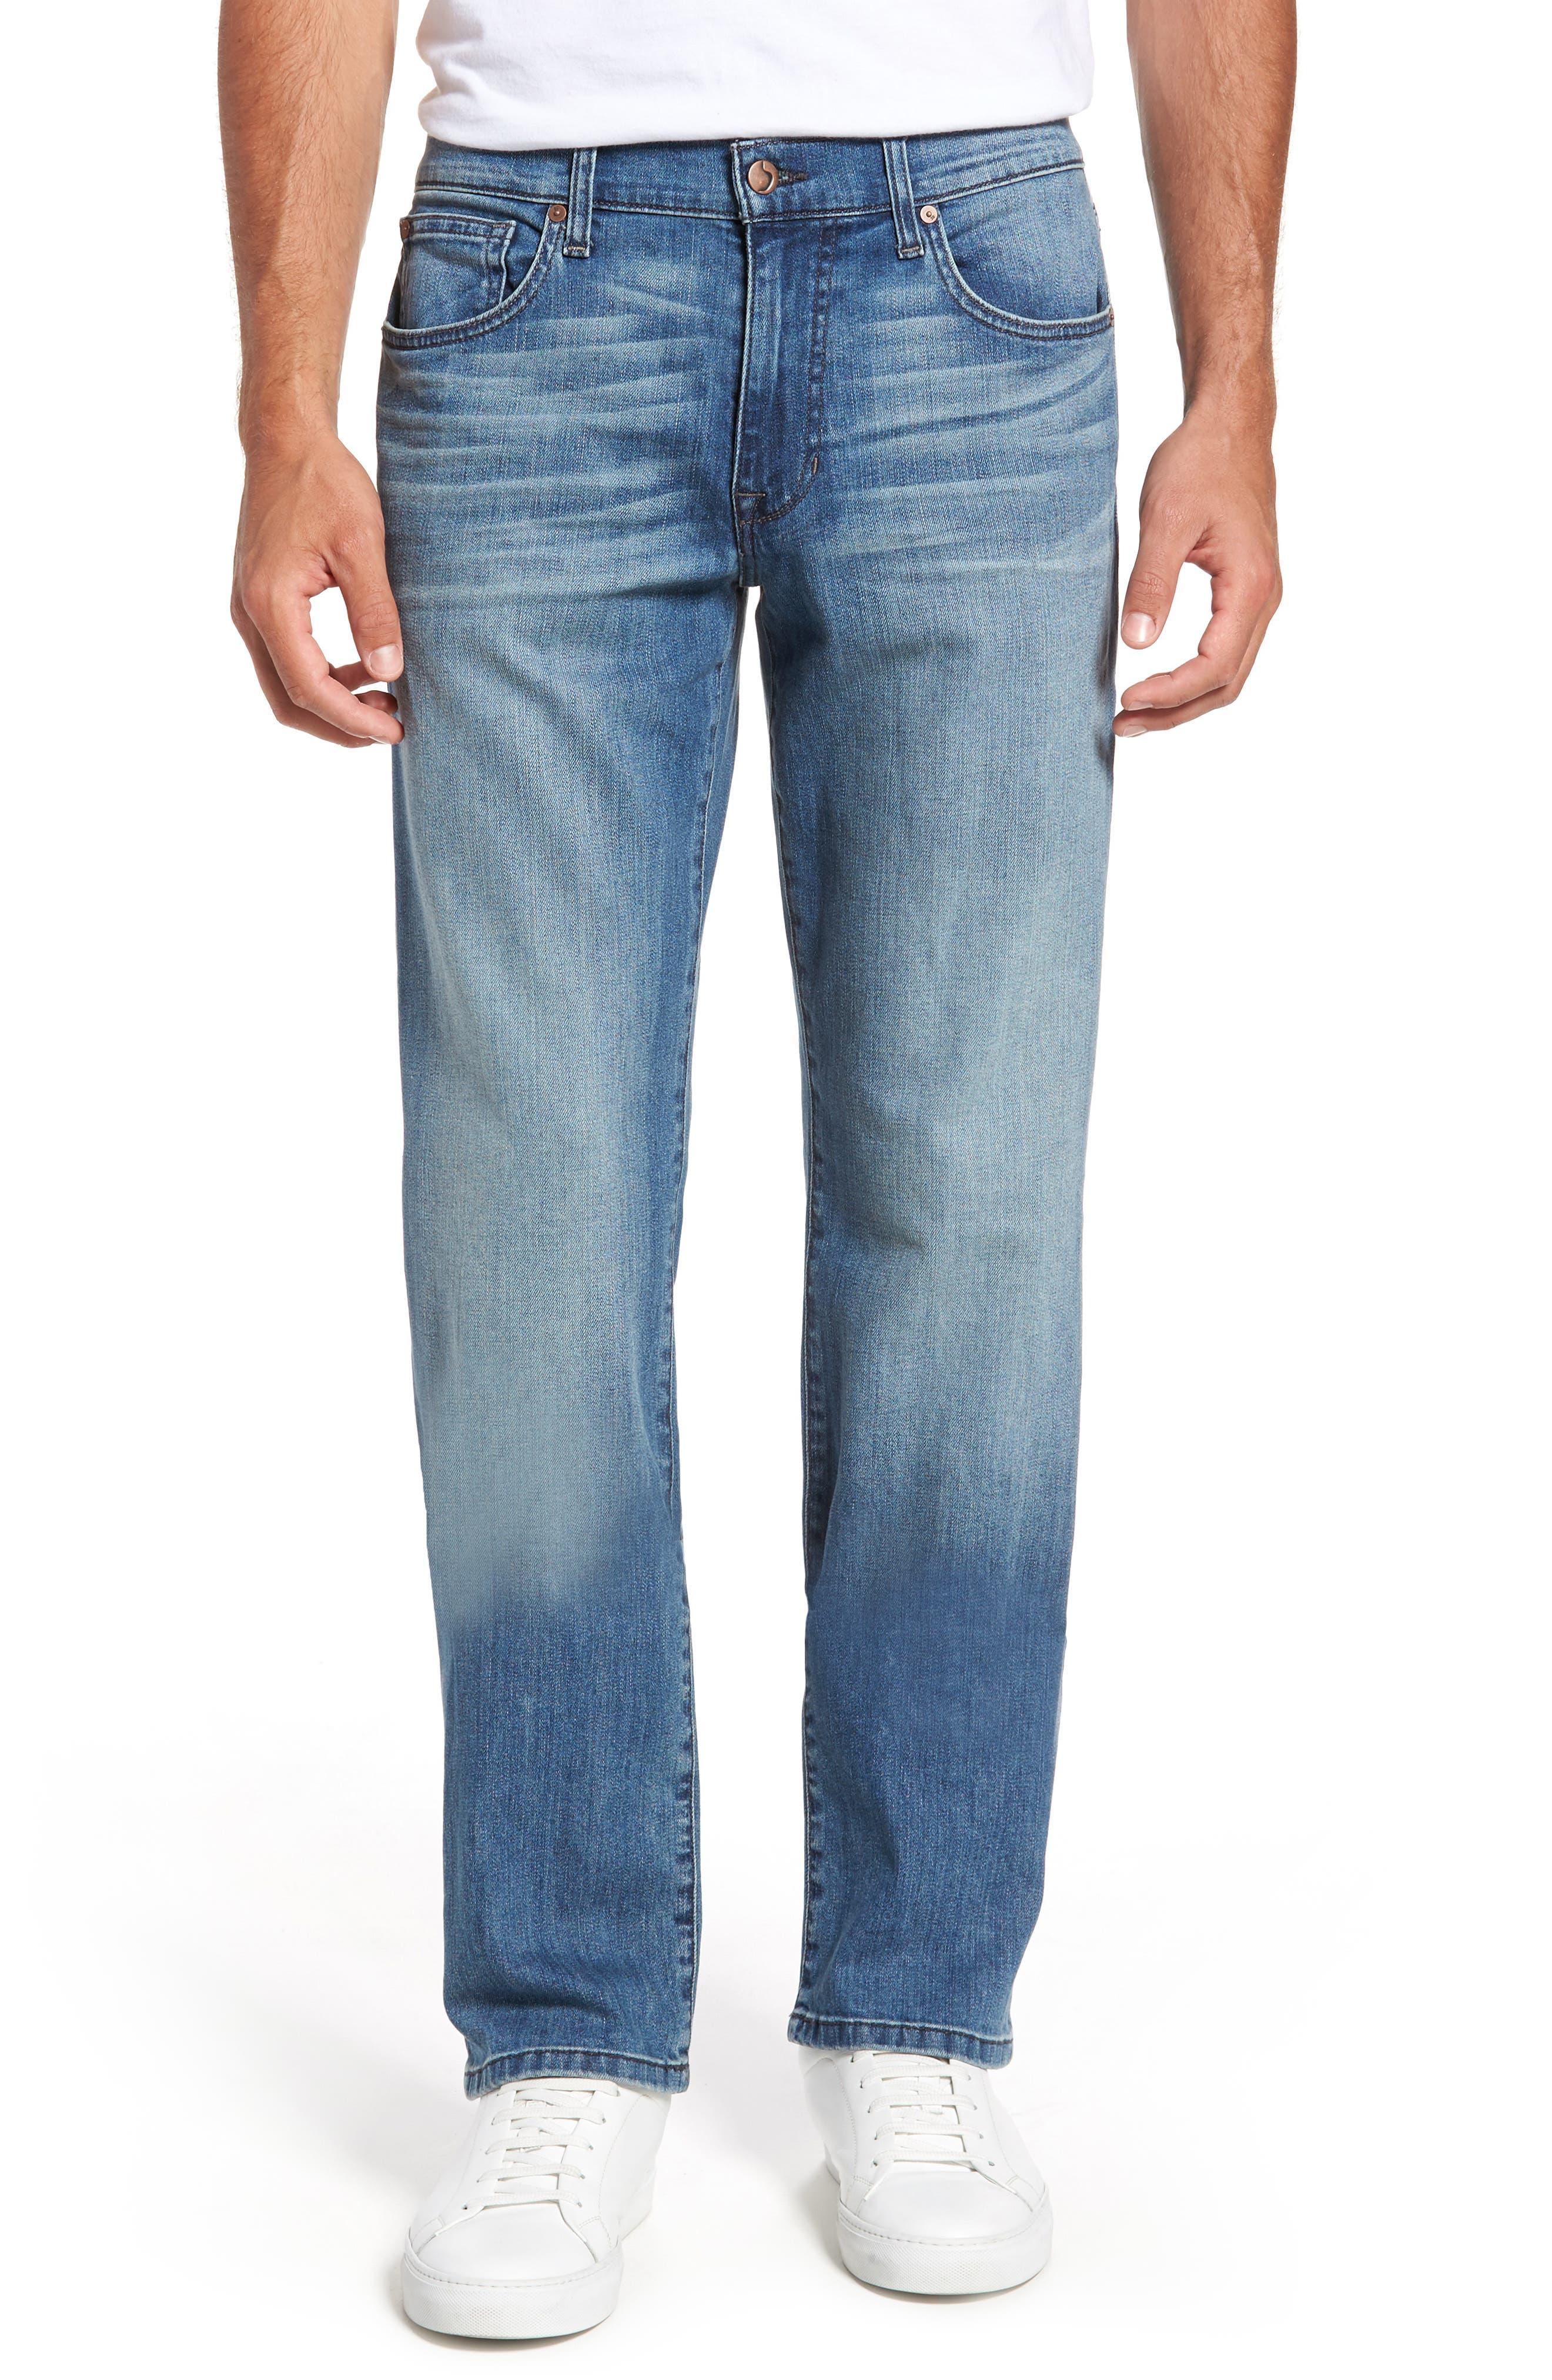 Alternate Image 1 Selected - Joe's Slim Fit Jeans (Jayson)